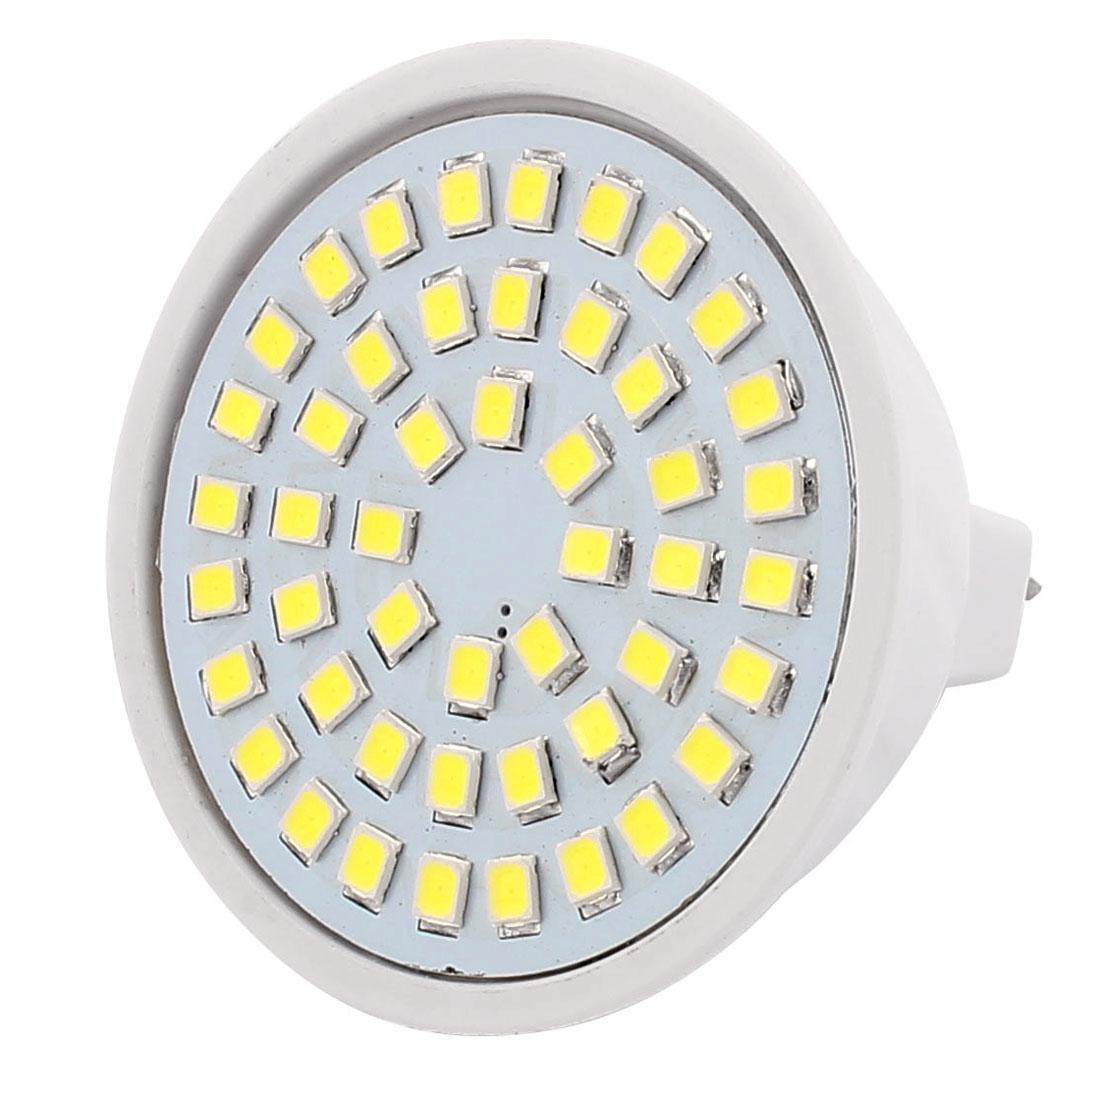 MR16 SMD 2835 48 LEDs Plastic Energy-Saving LED Lamp Bulb White AC 110V 4W